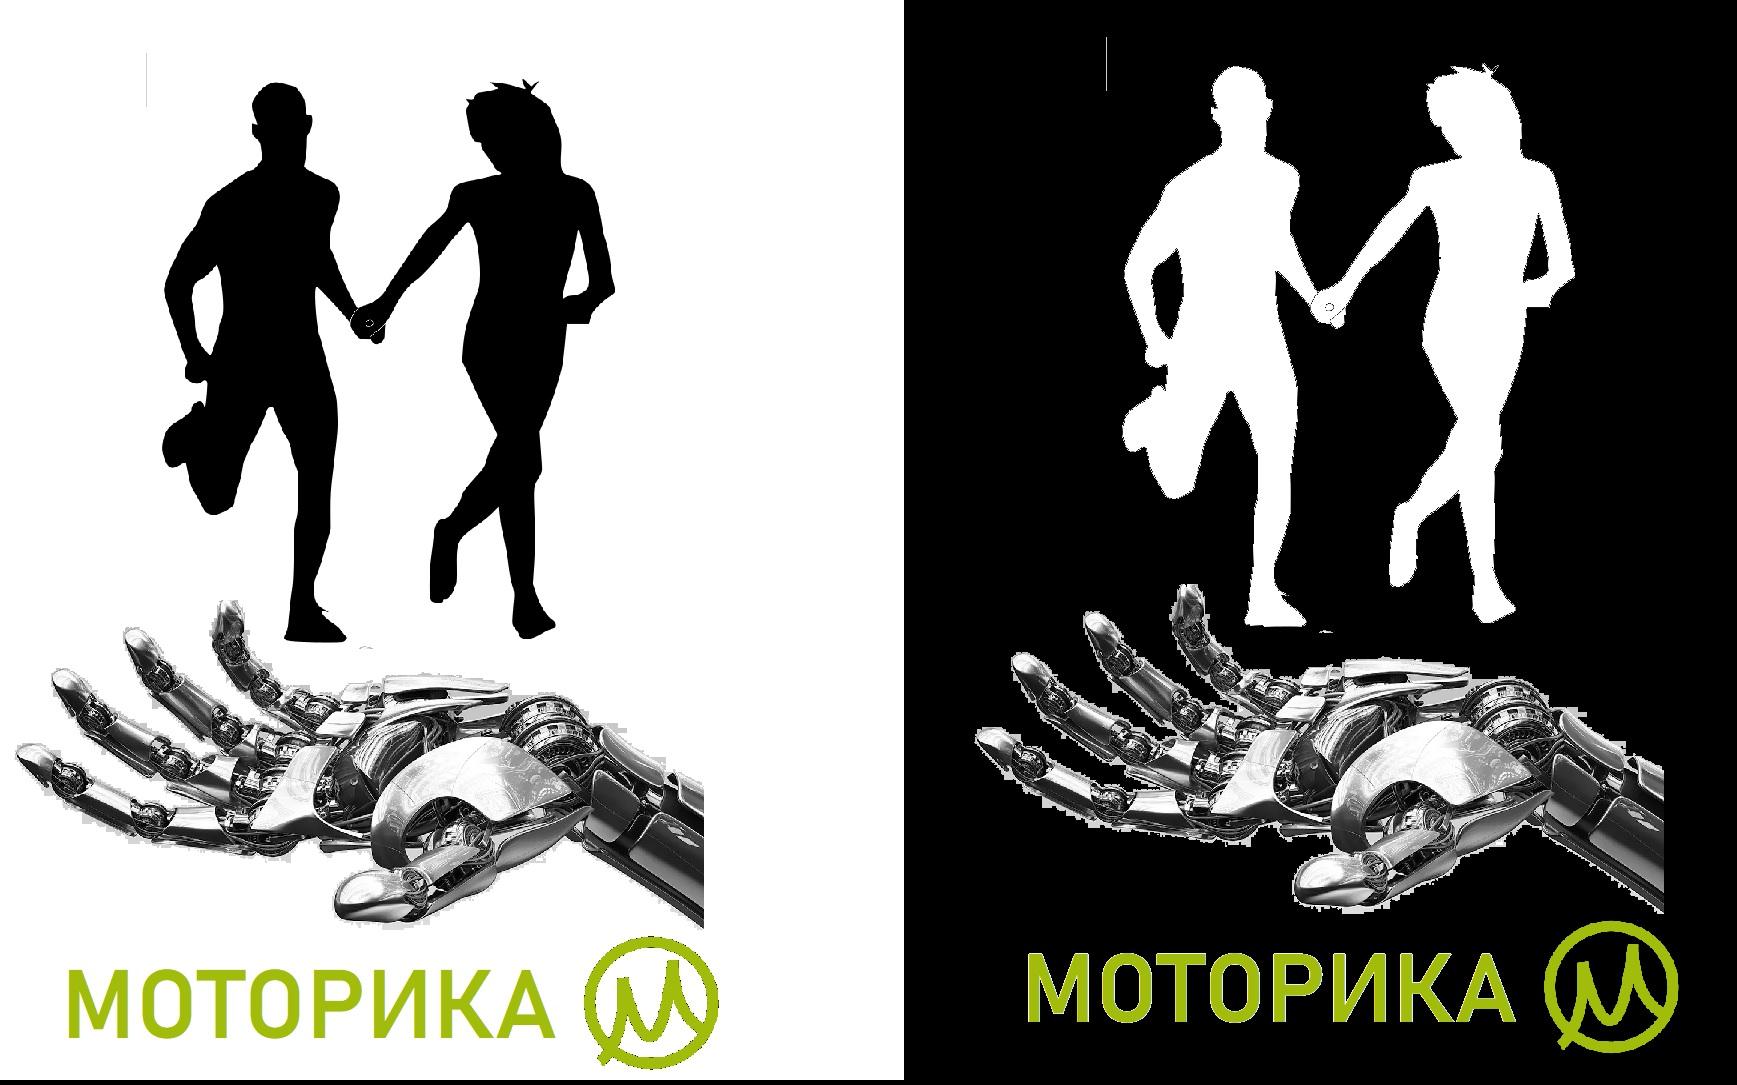 Нарисовать принты на футболки для компании Моторика фото f_50060a1415bbe254.jpg